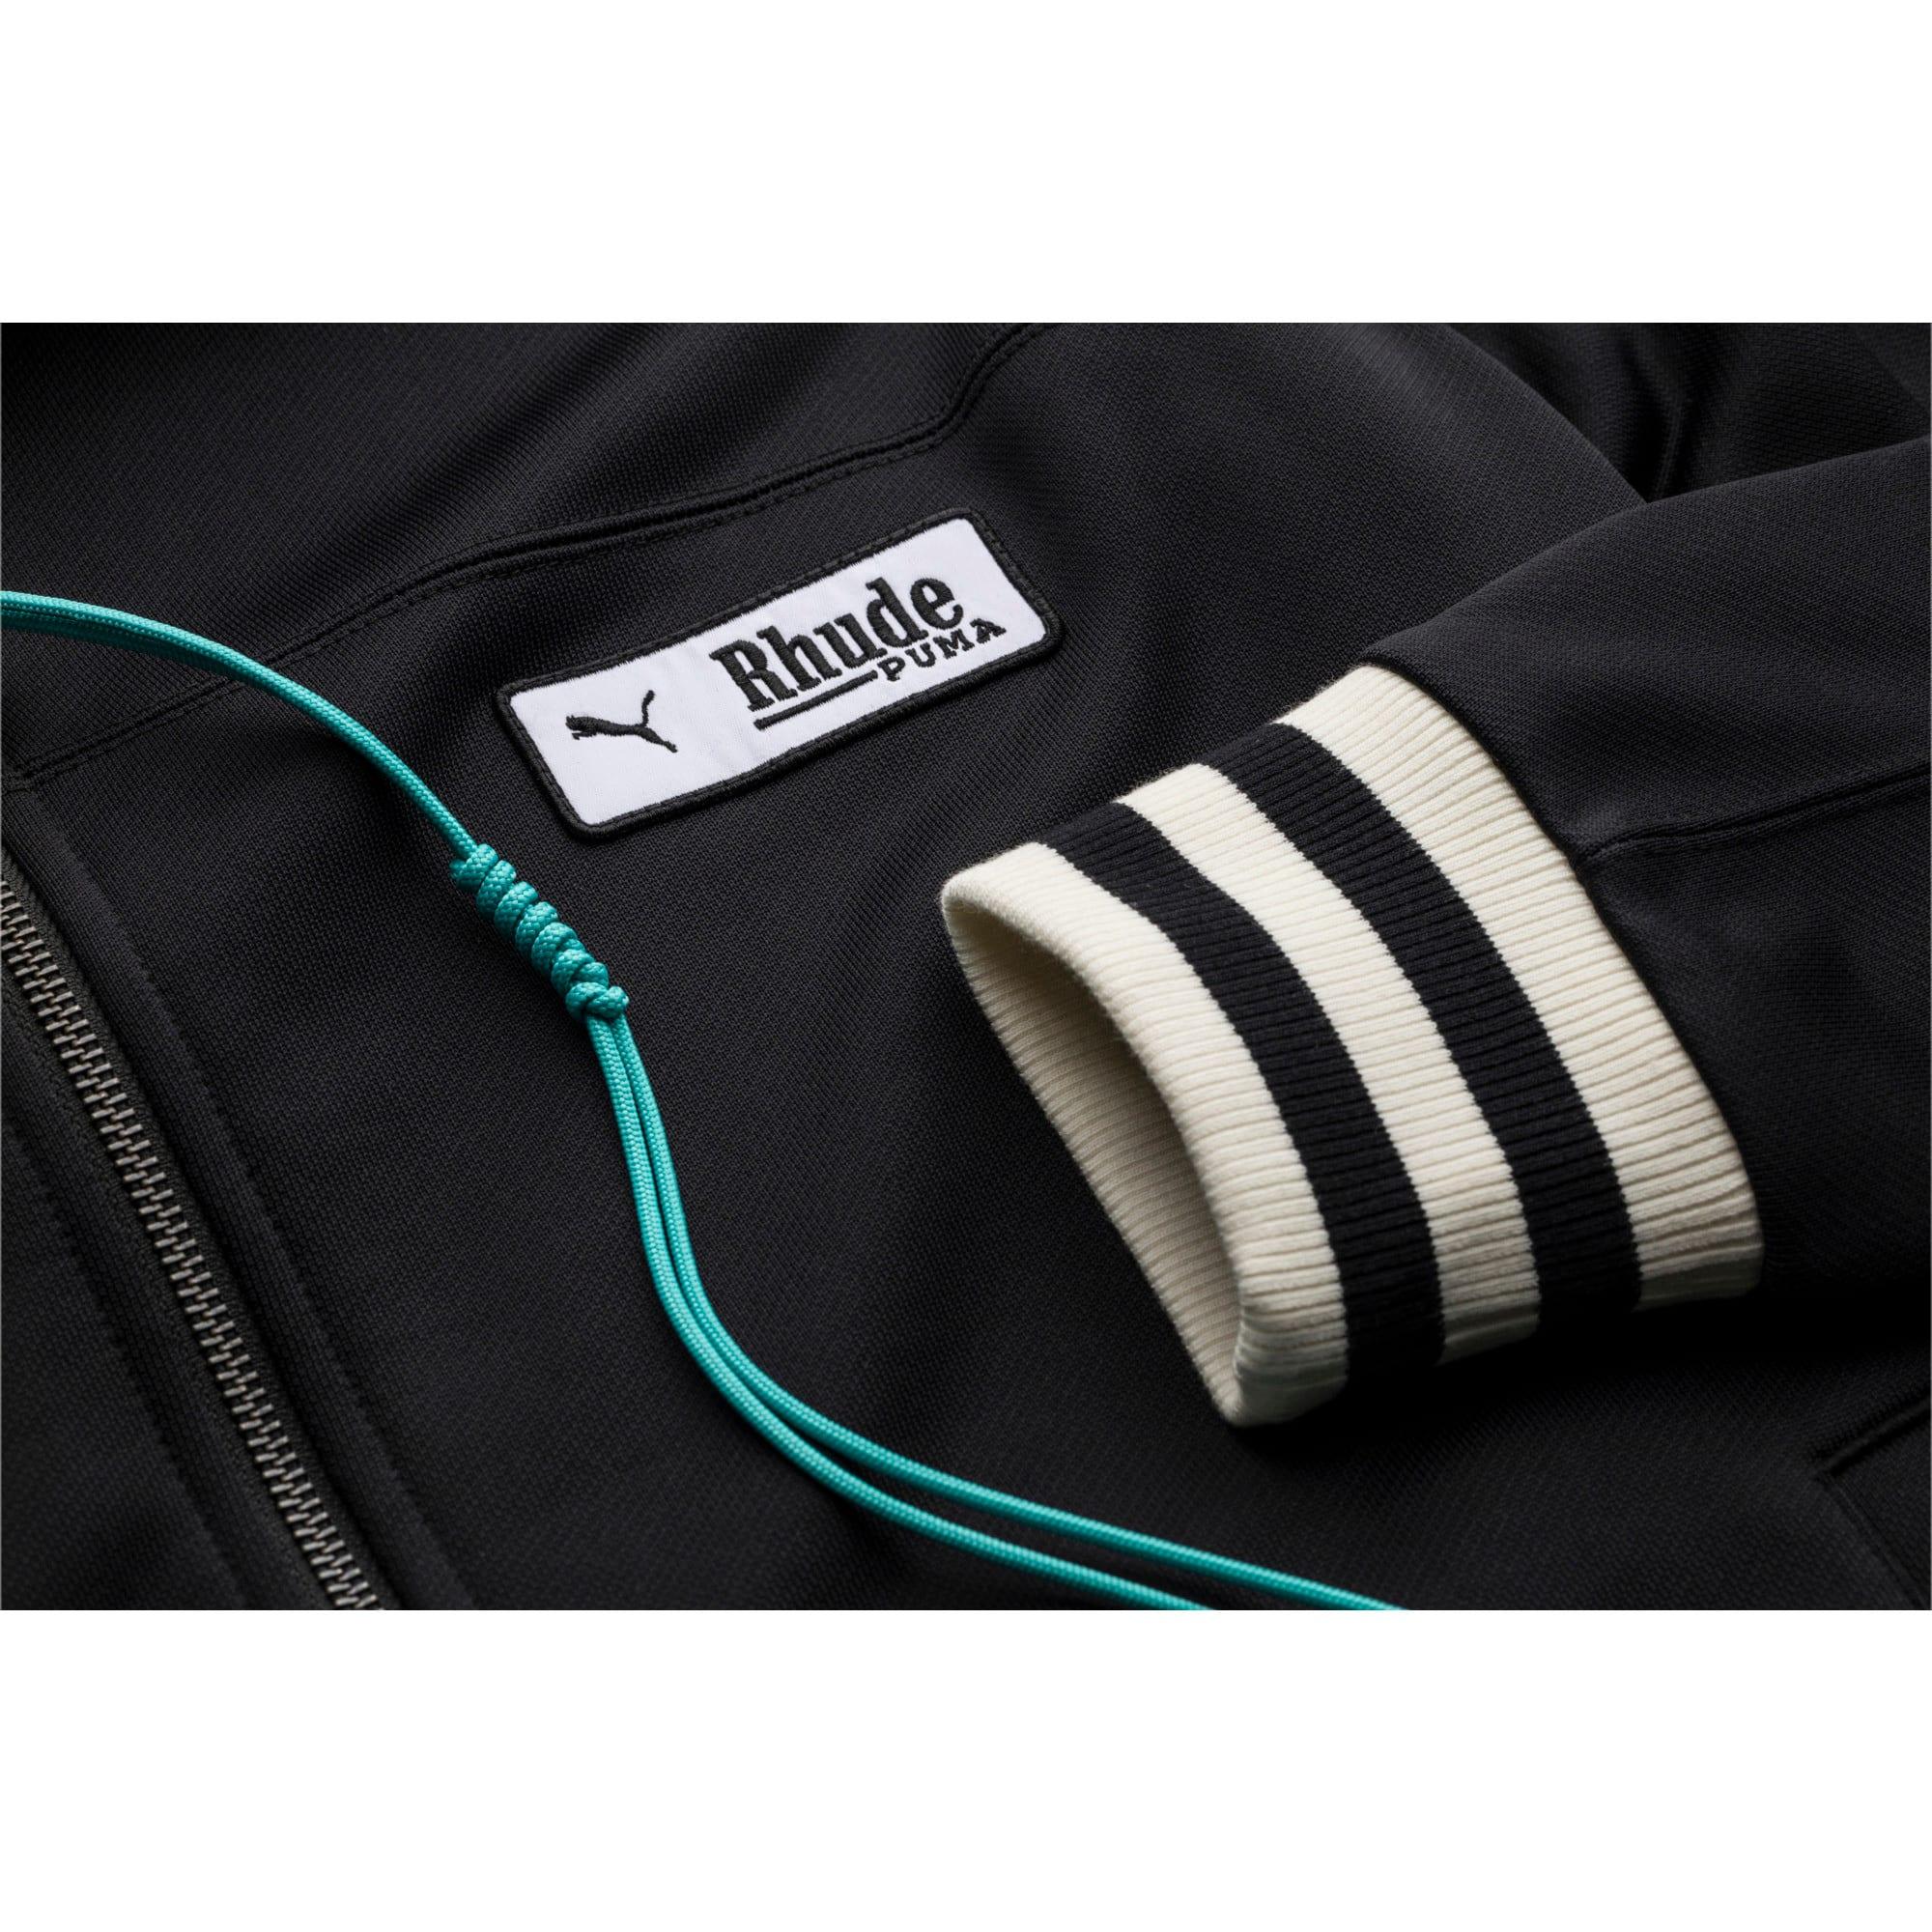 Thumbnail 3 of PUMA x RHUDE XTG Men's Track Jacket, Puma Black, medium